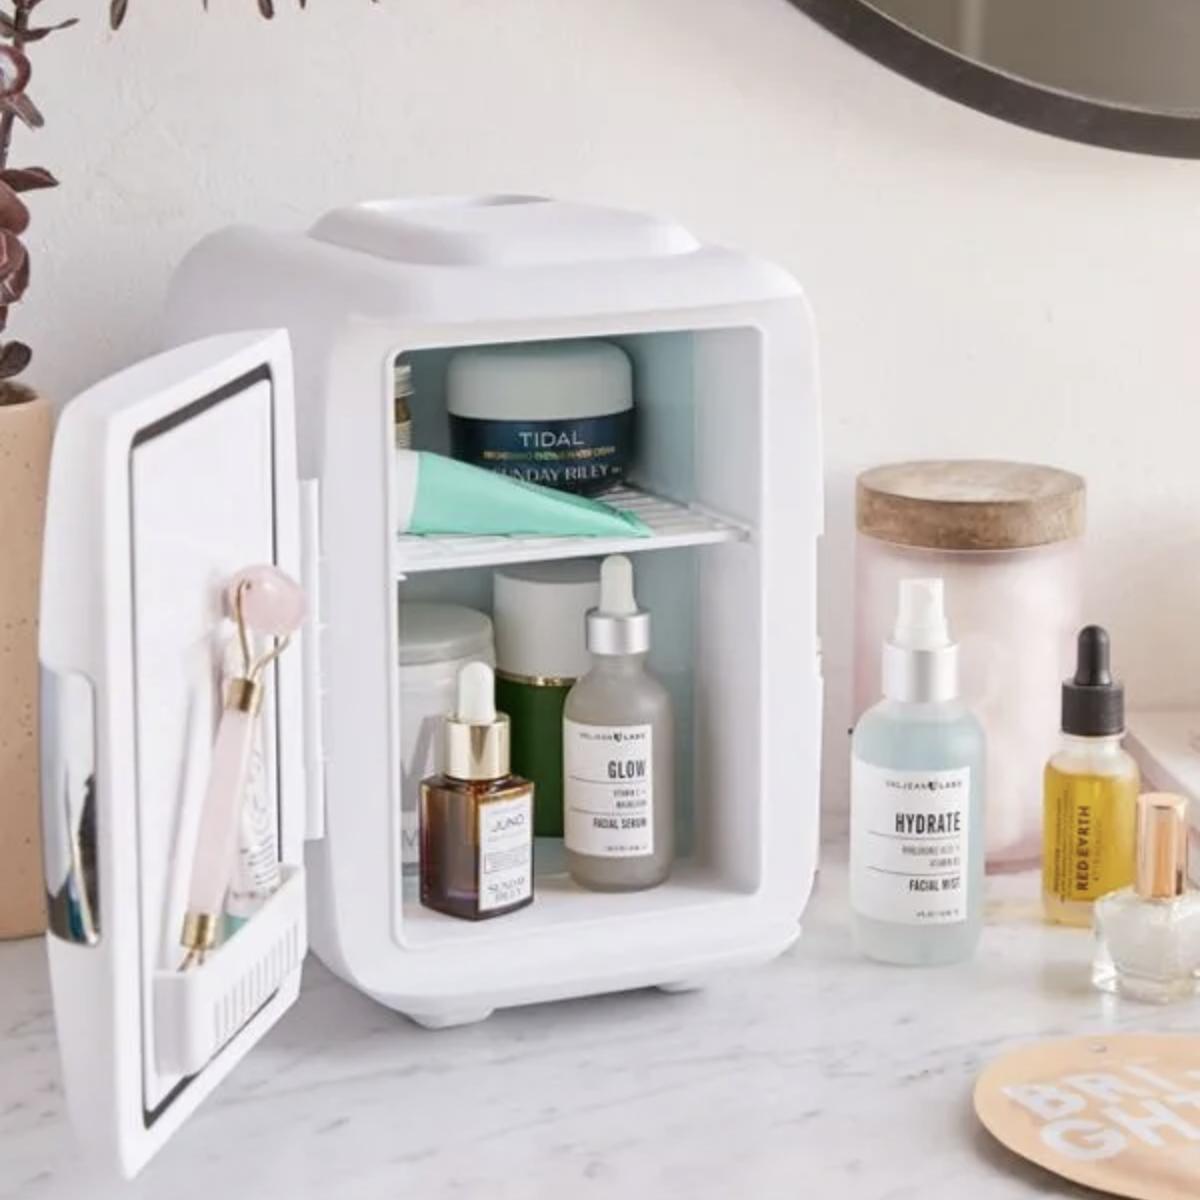 fashionista.com - Does Anyone Really Need A Skin-Care Fridge?